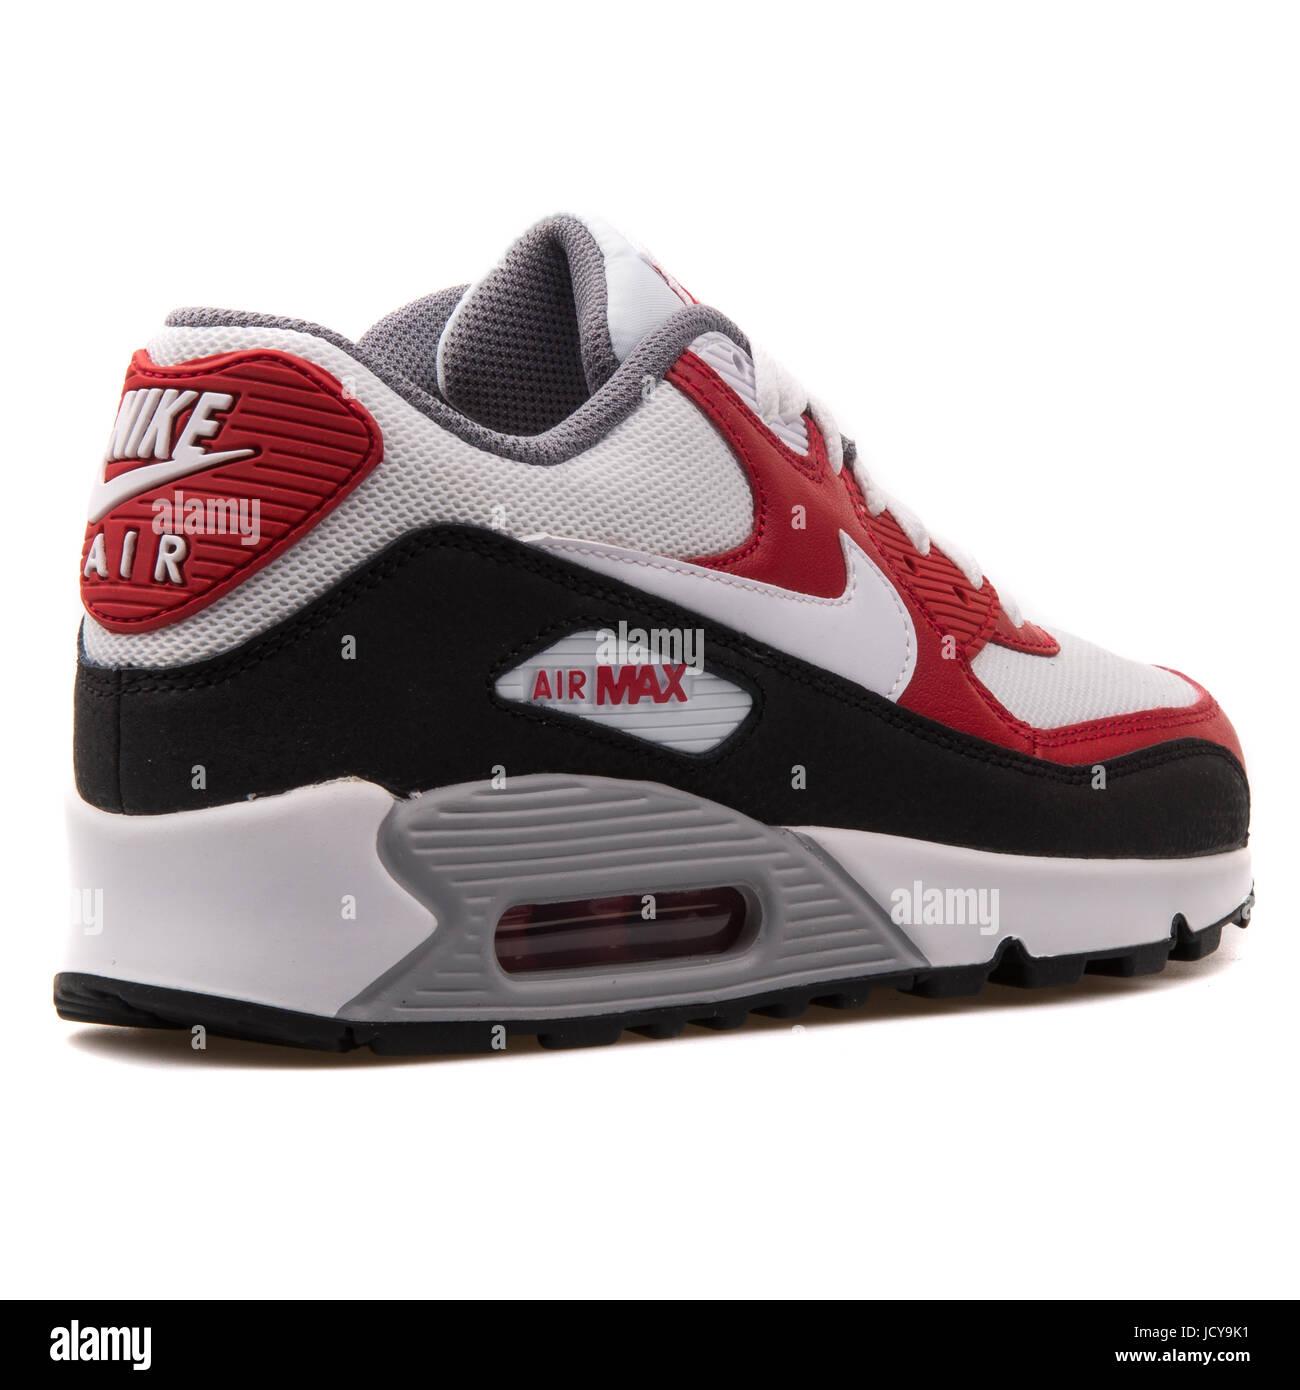 White Nike Air Max Trainers Sneakers Kicks Photos   White Nike Air ... 2ef096d92634